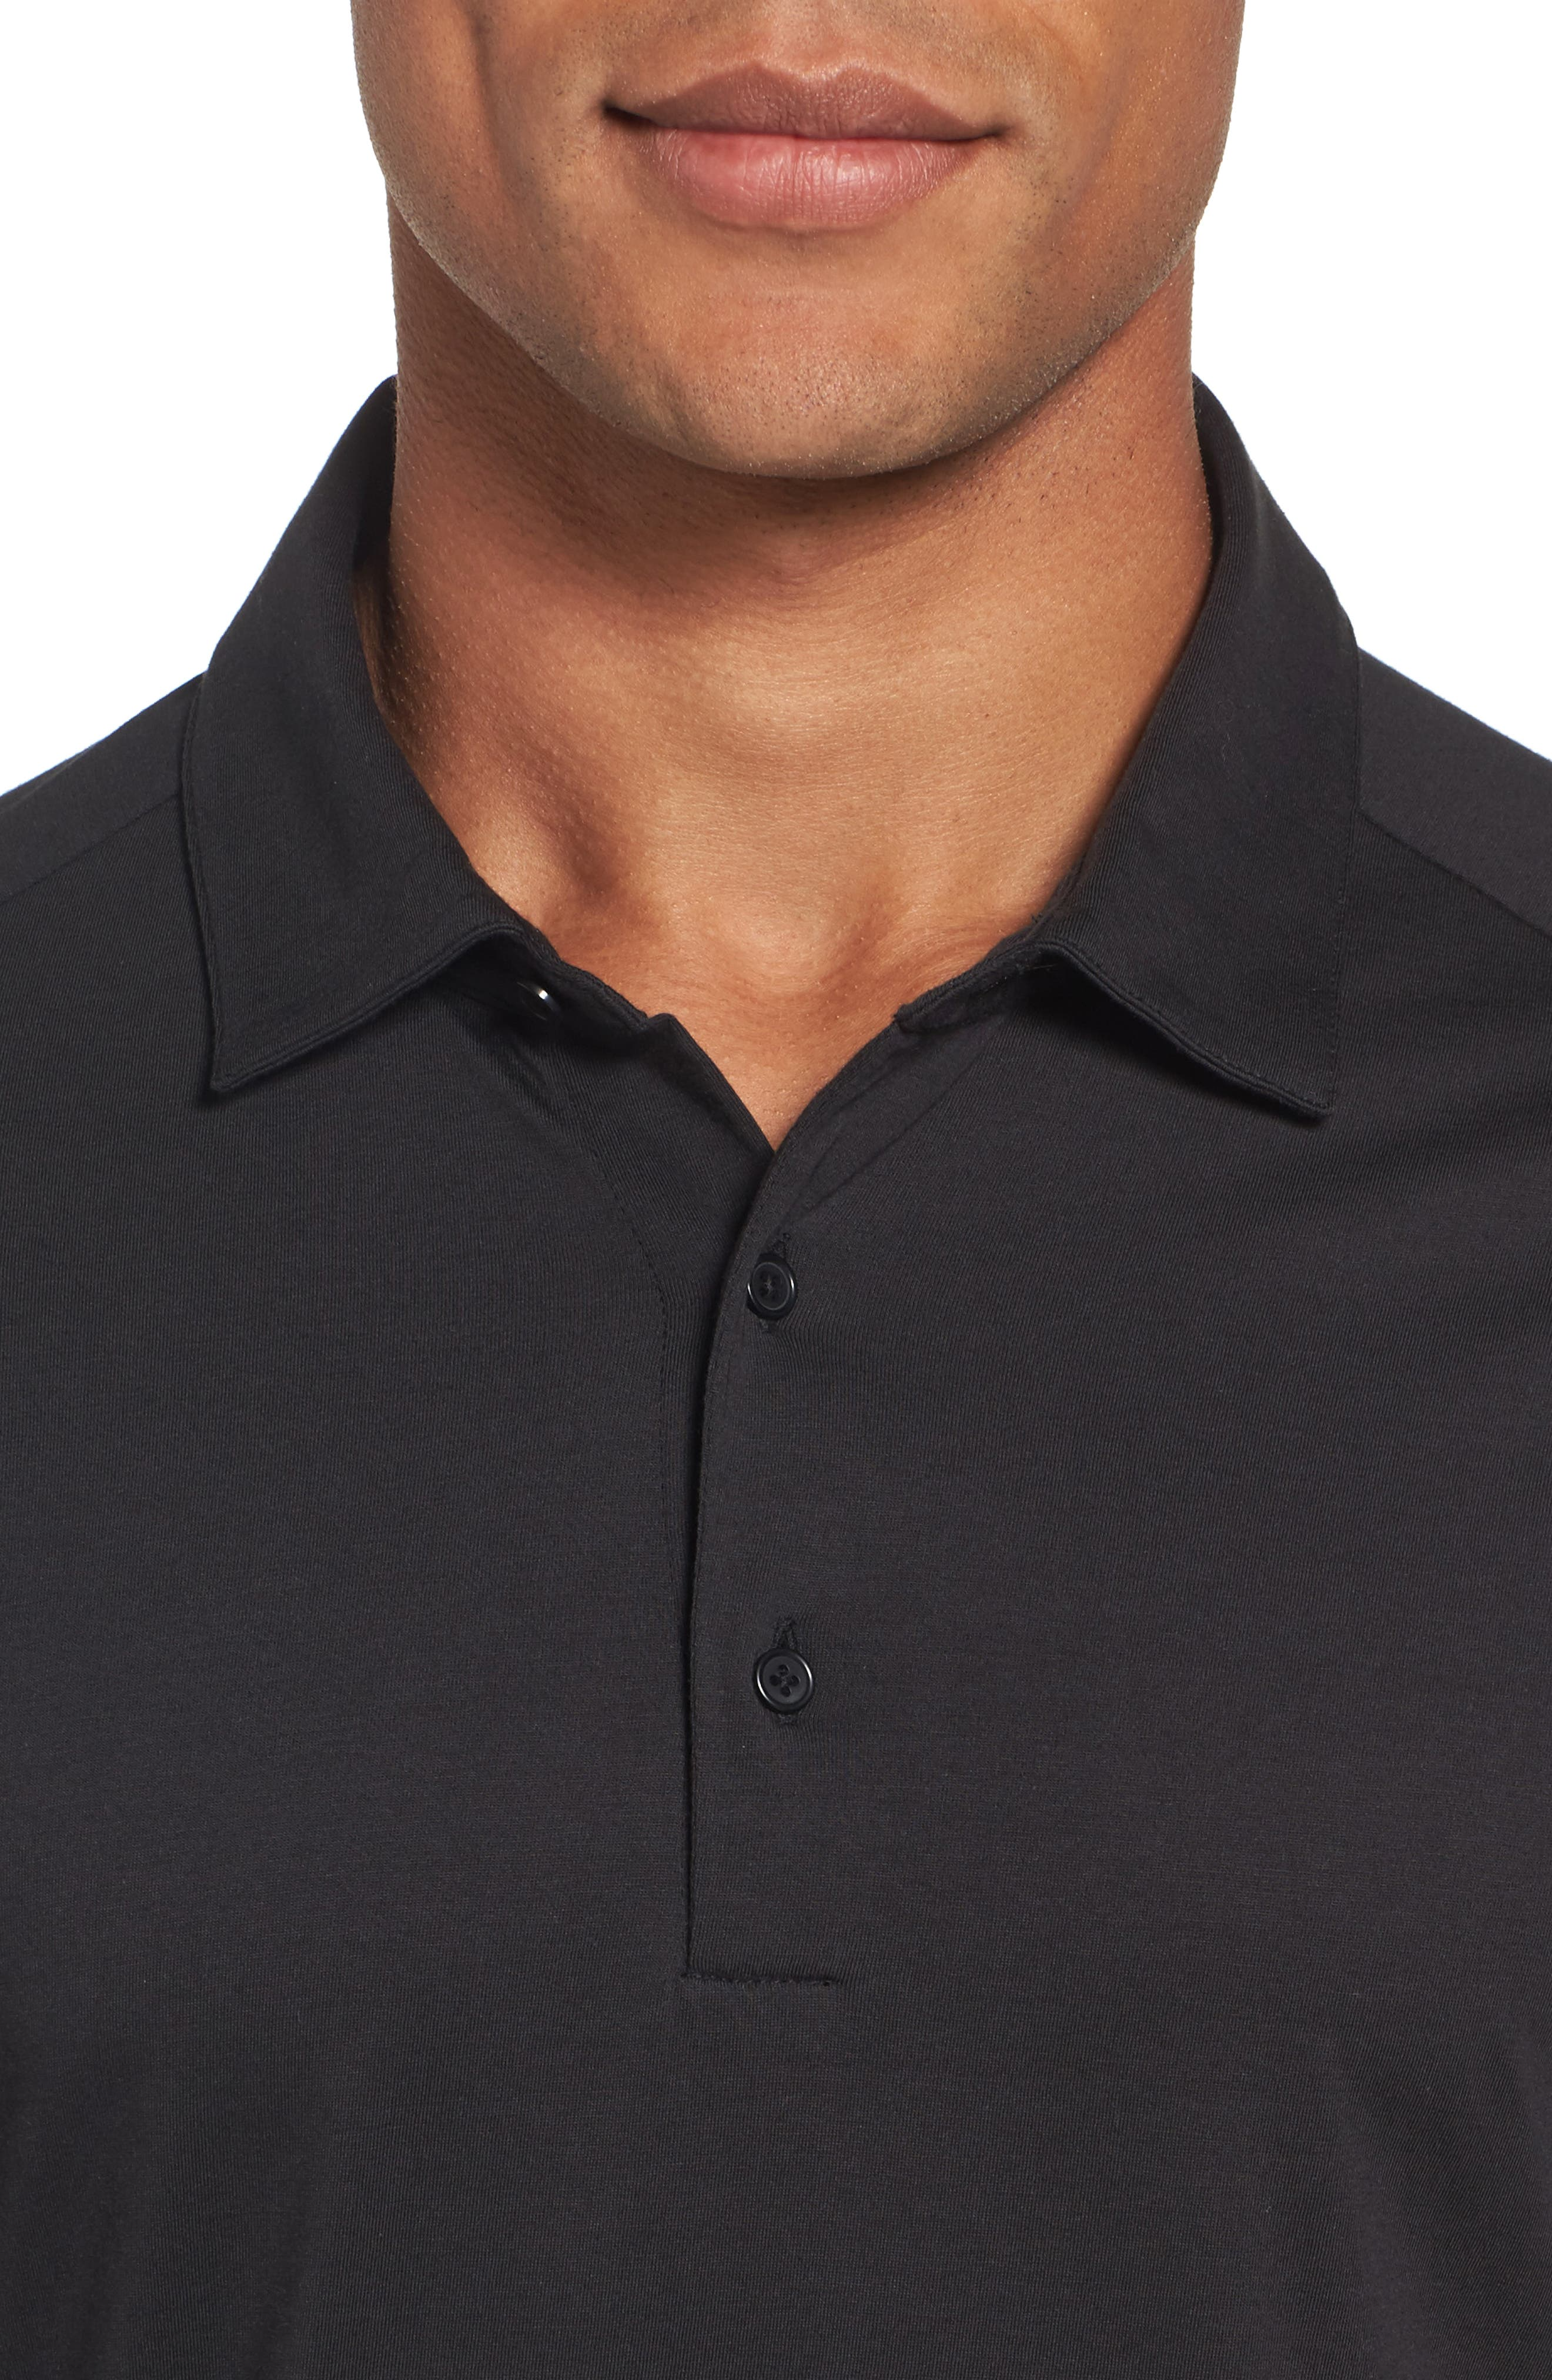 Superfine Slim Fit Long Sleeve Polo,                             Alternate thumbnail 4, color,                             Caviar Black